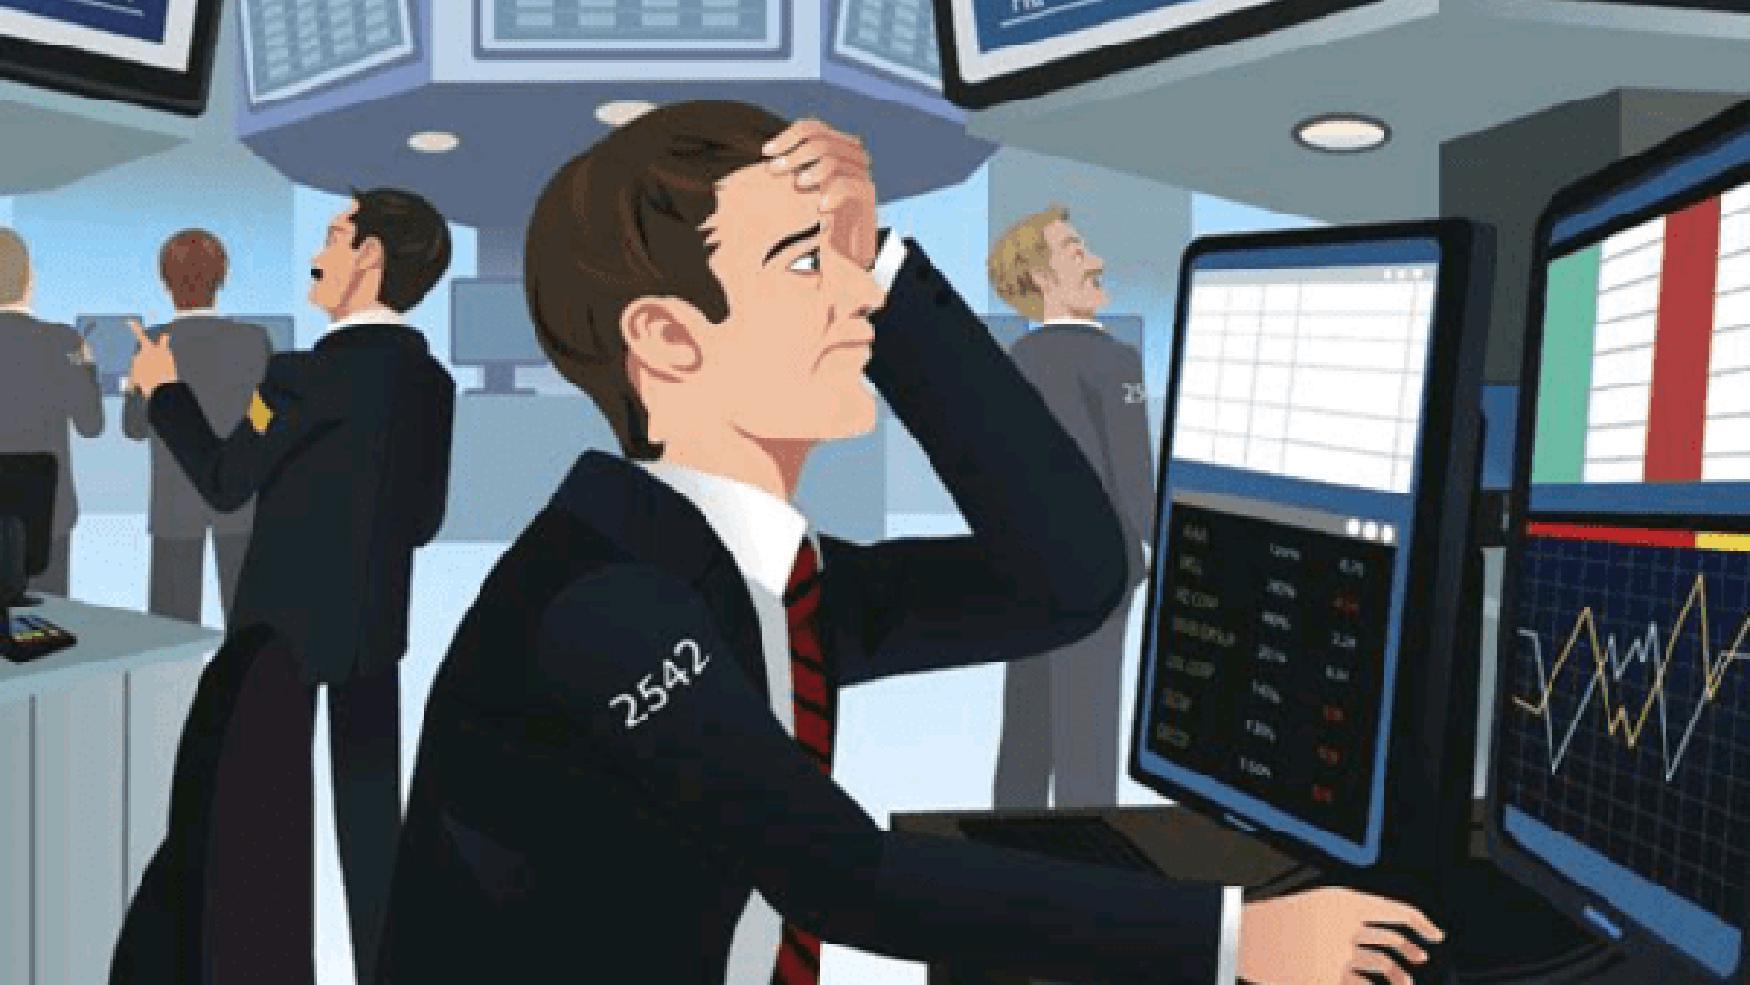 common ways lose money in the Stock Market